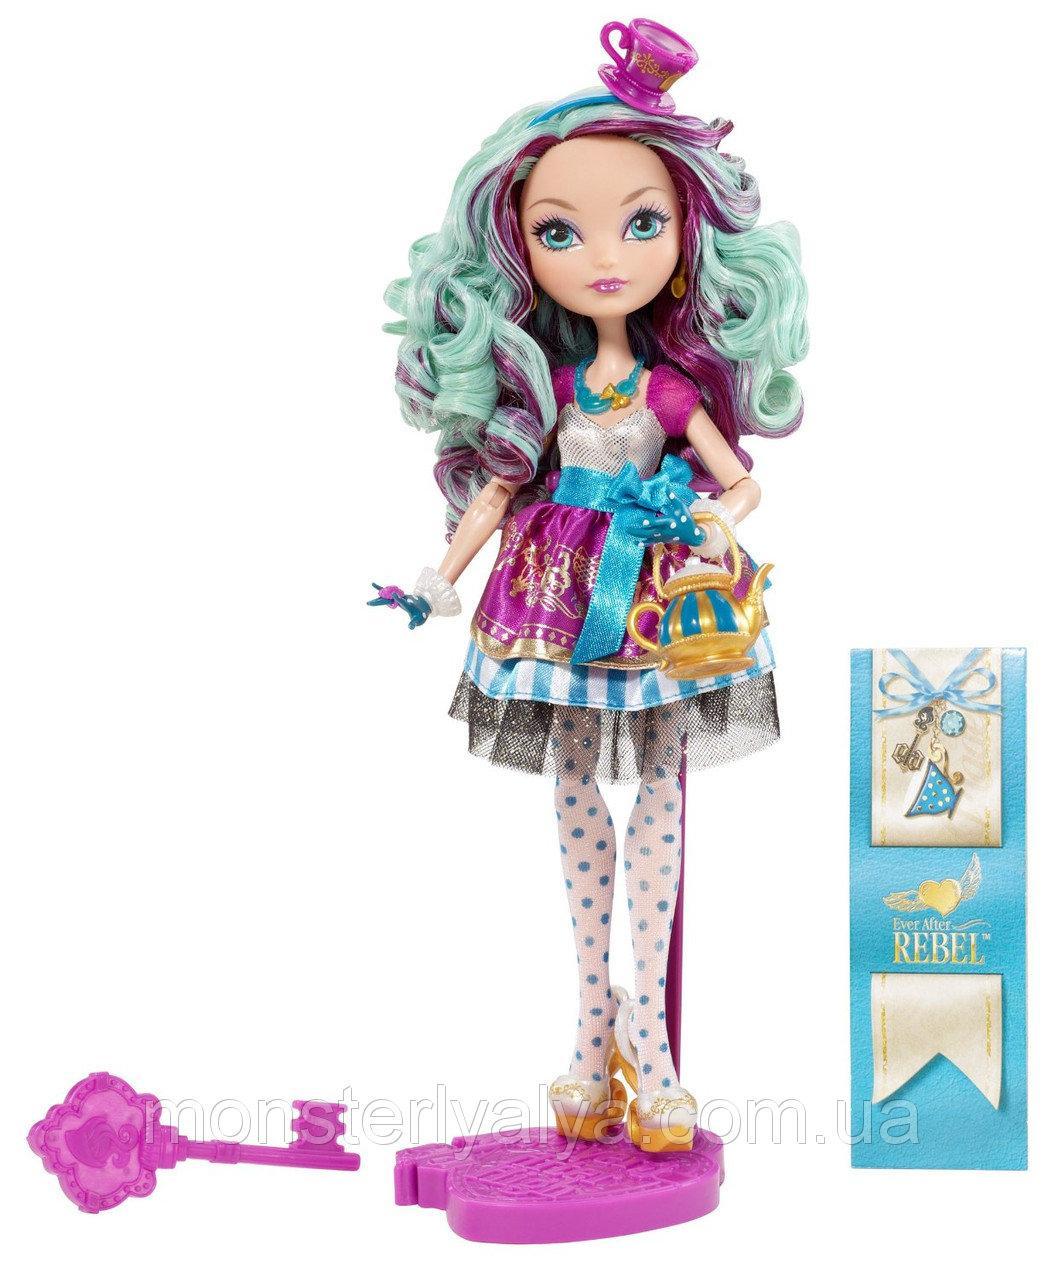 Кукла Эвер афтер хай Мэделин Хэттер базовая первый выпуск  Ever After High Madeline Hatter Doll